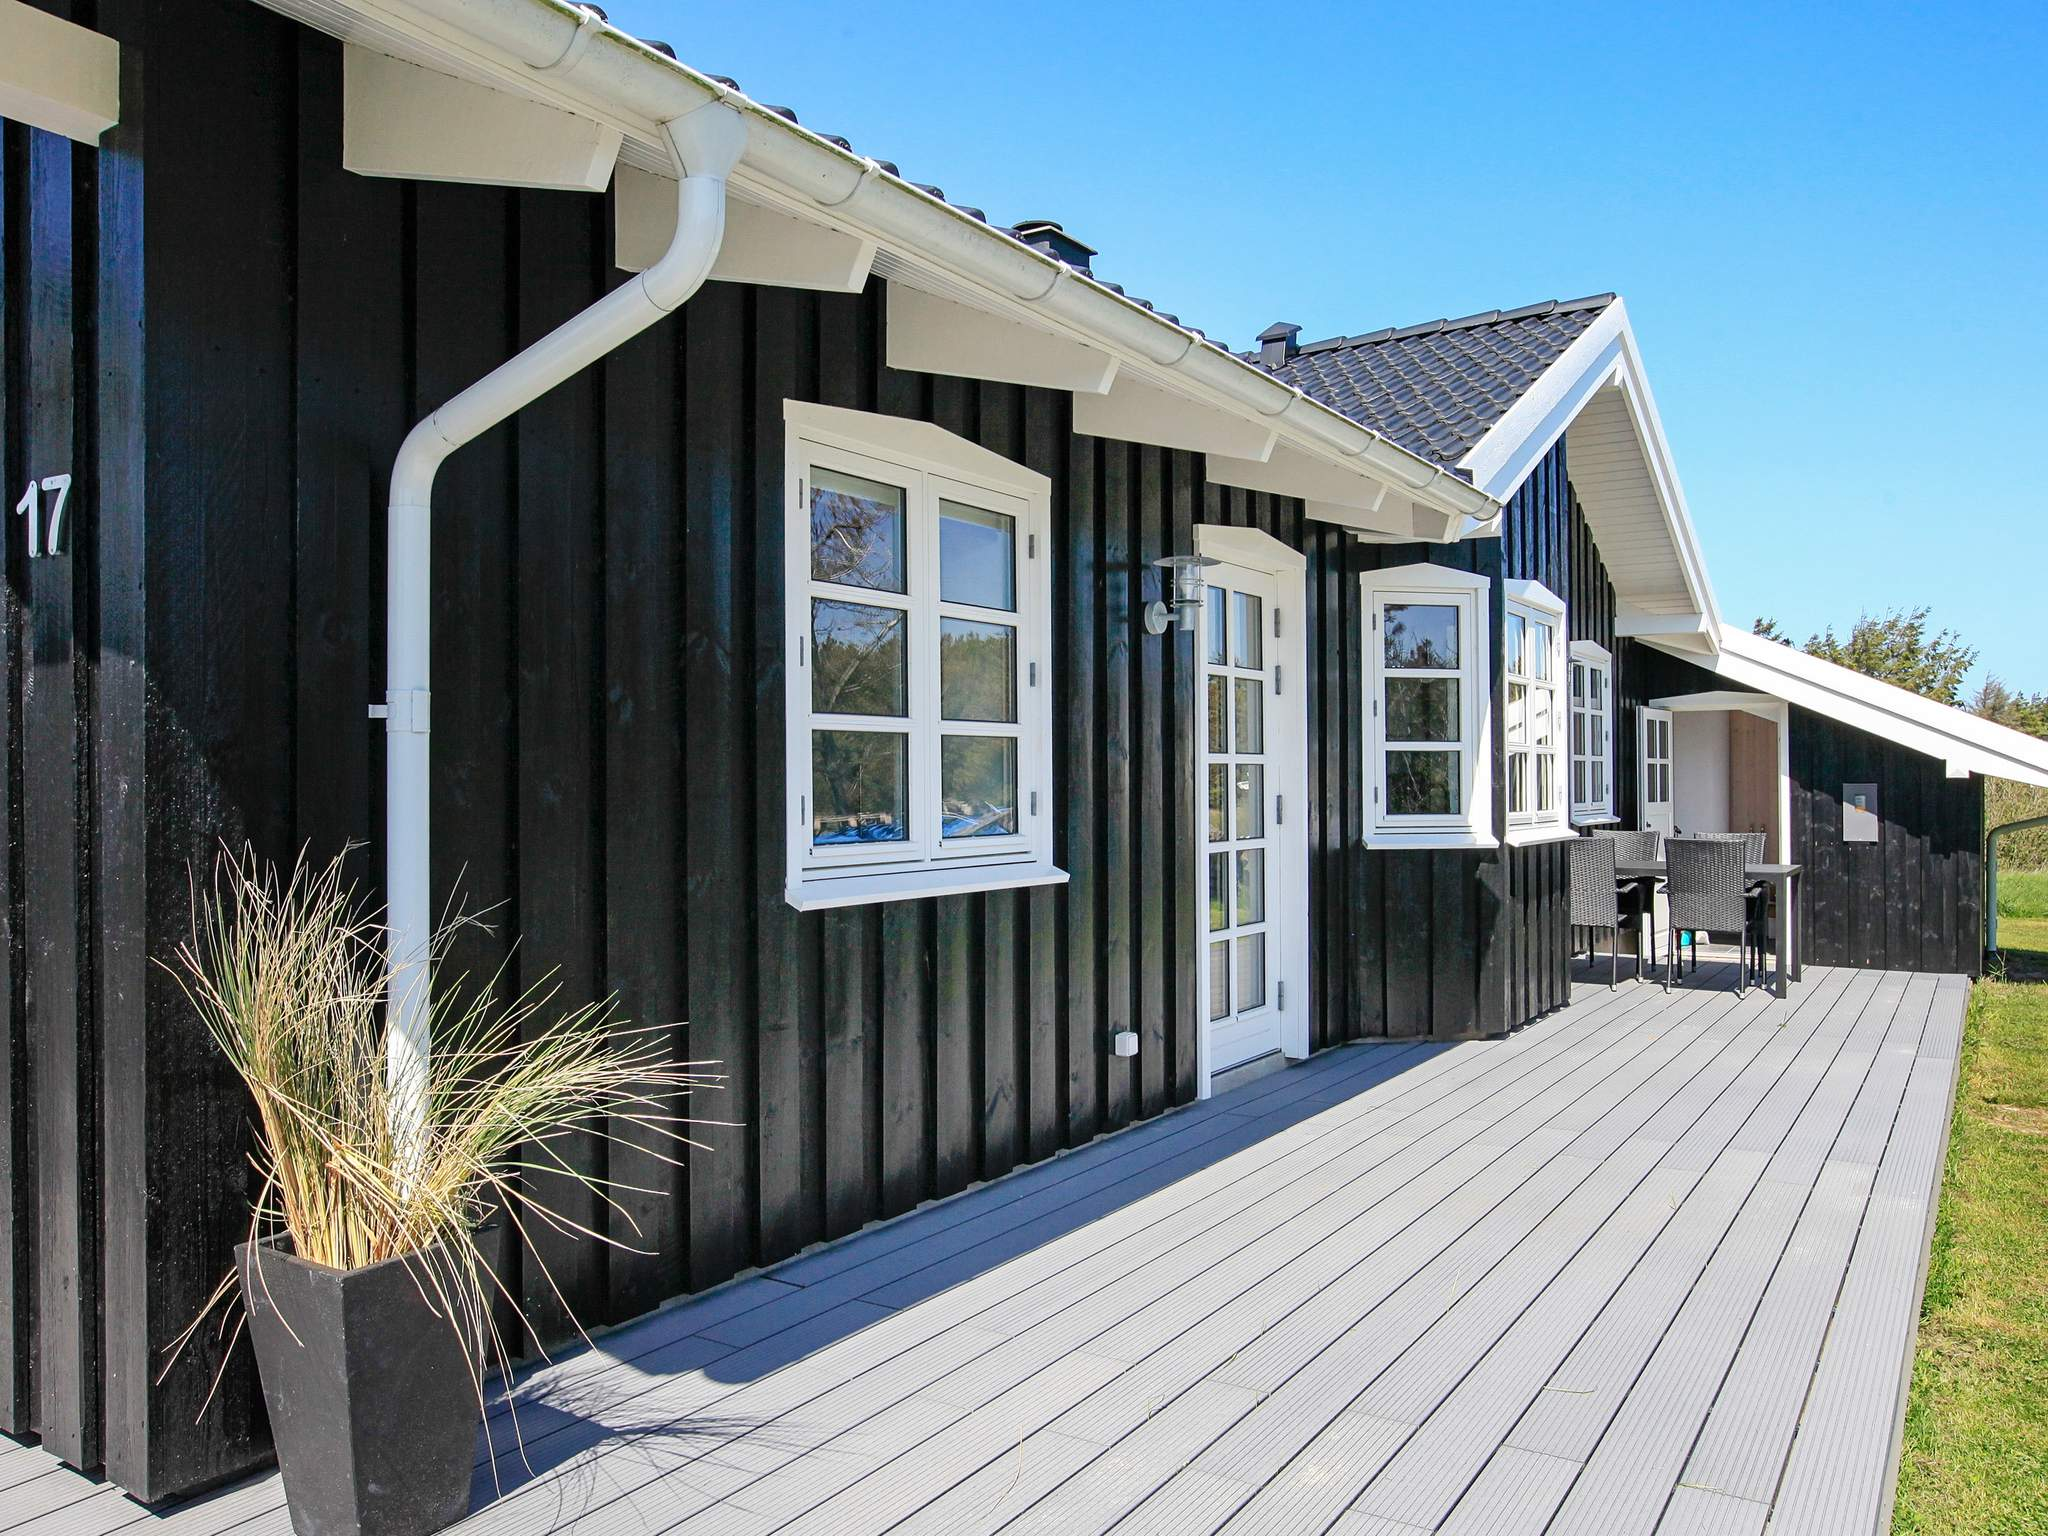 10 persoons vakantiehuis in Saltum Strand